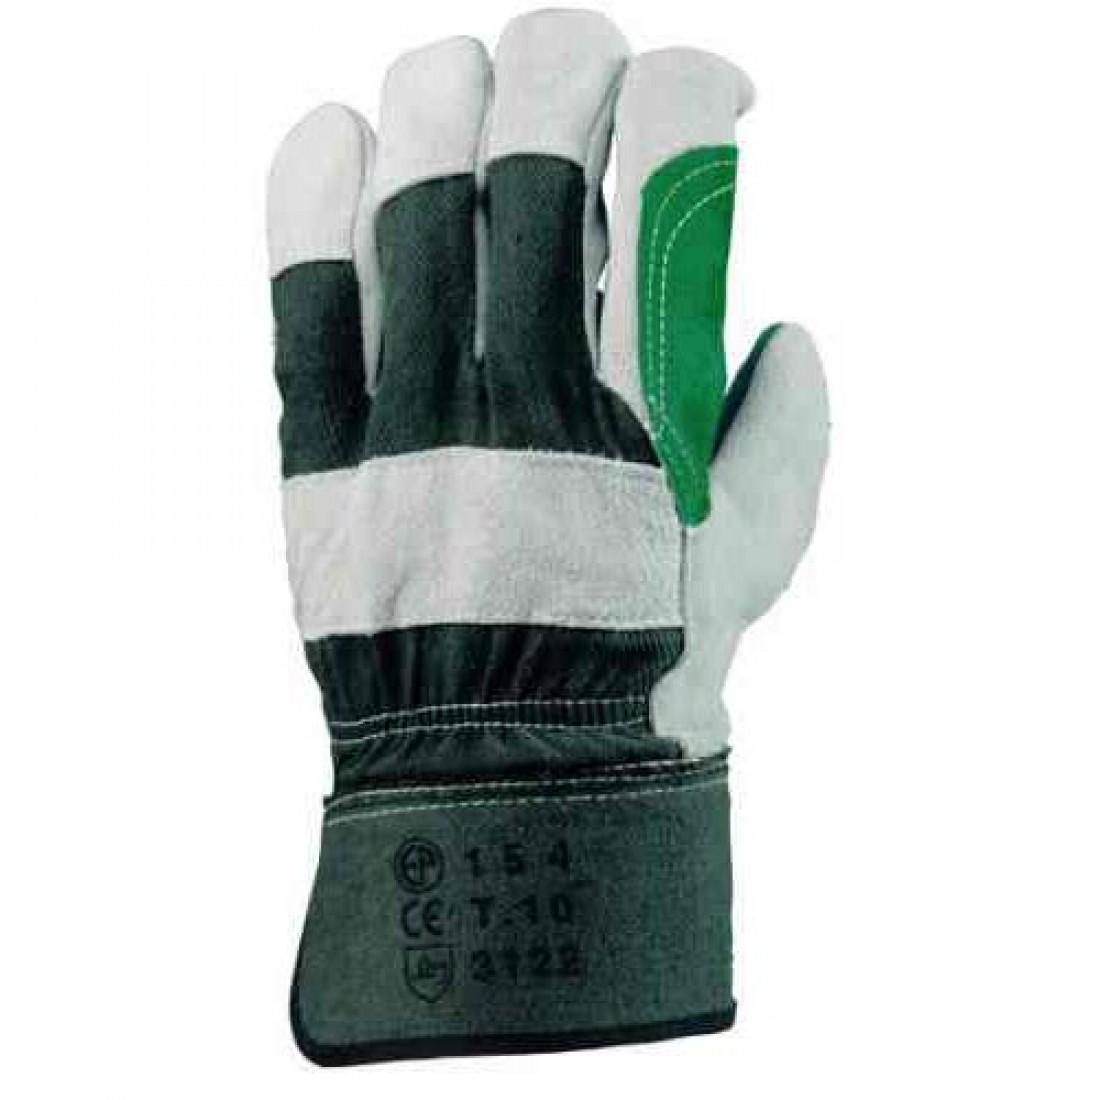 04b87cf515 Γκρι - Πράσινα Δερμάτινα Γάντια DOCKERS